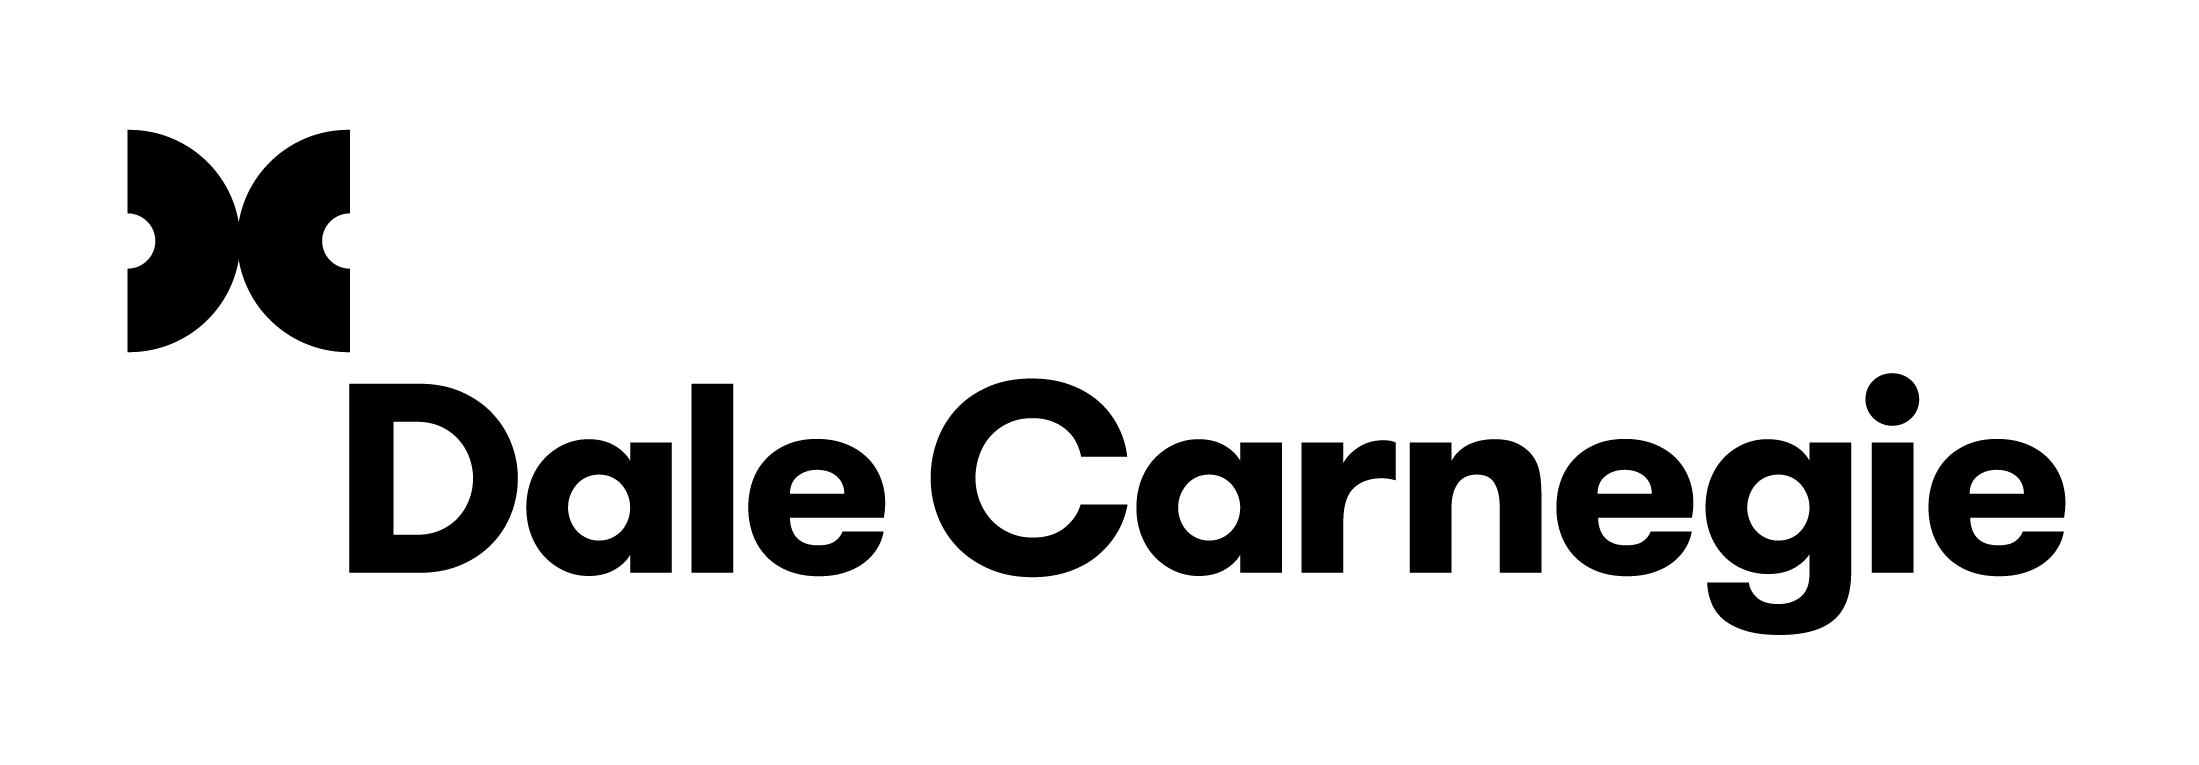 Dale_Carnegie_inline_lockup_logo